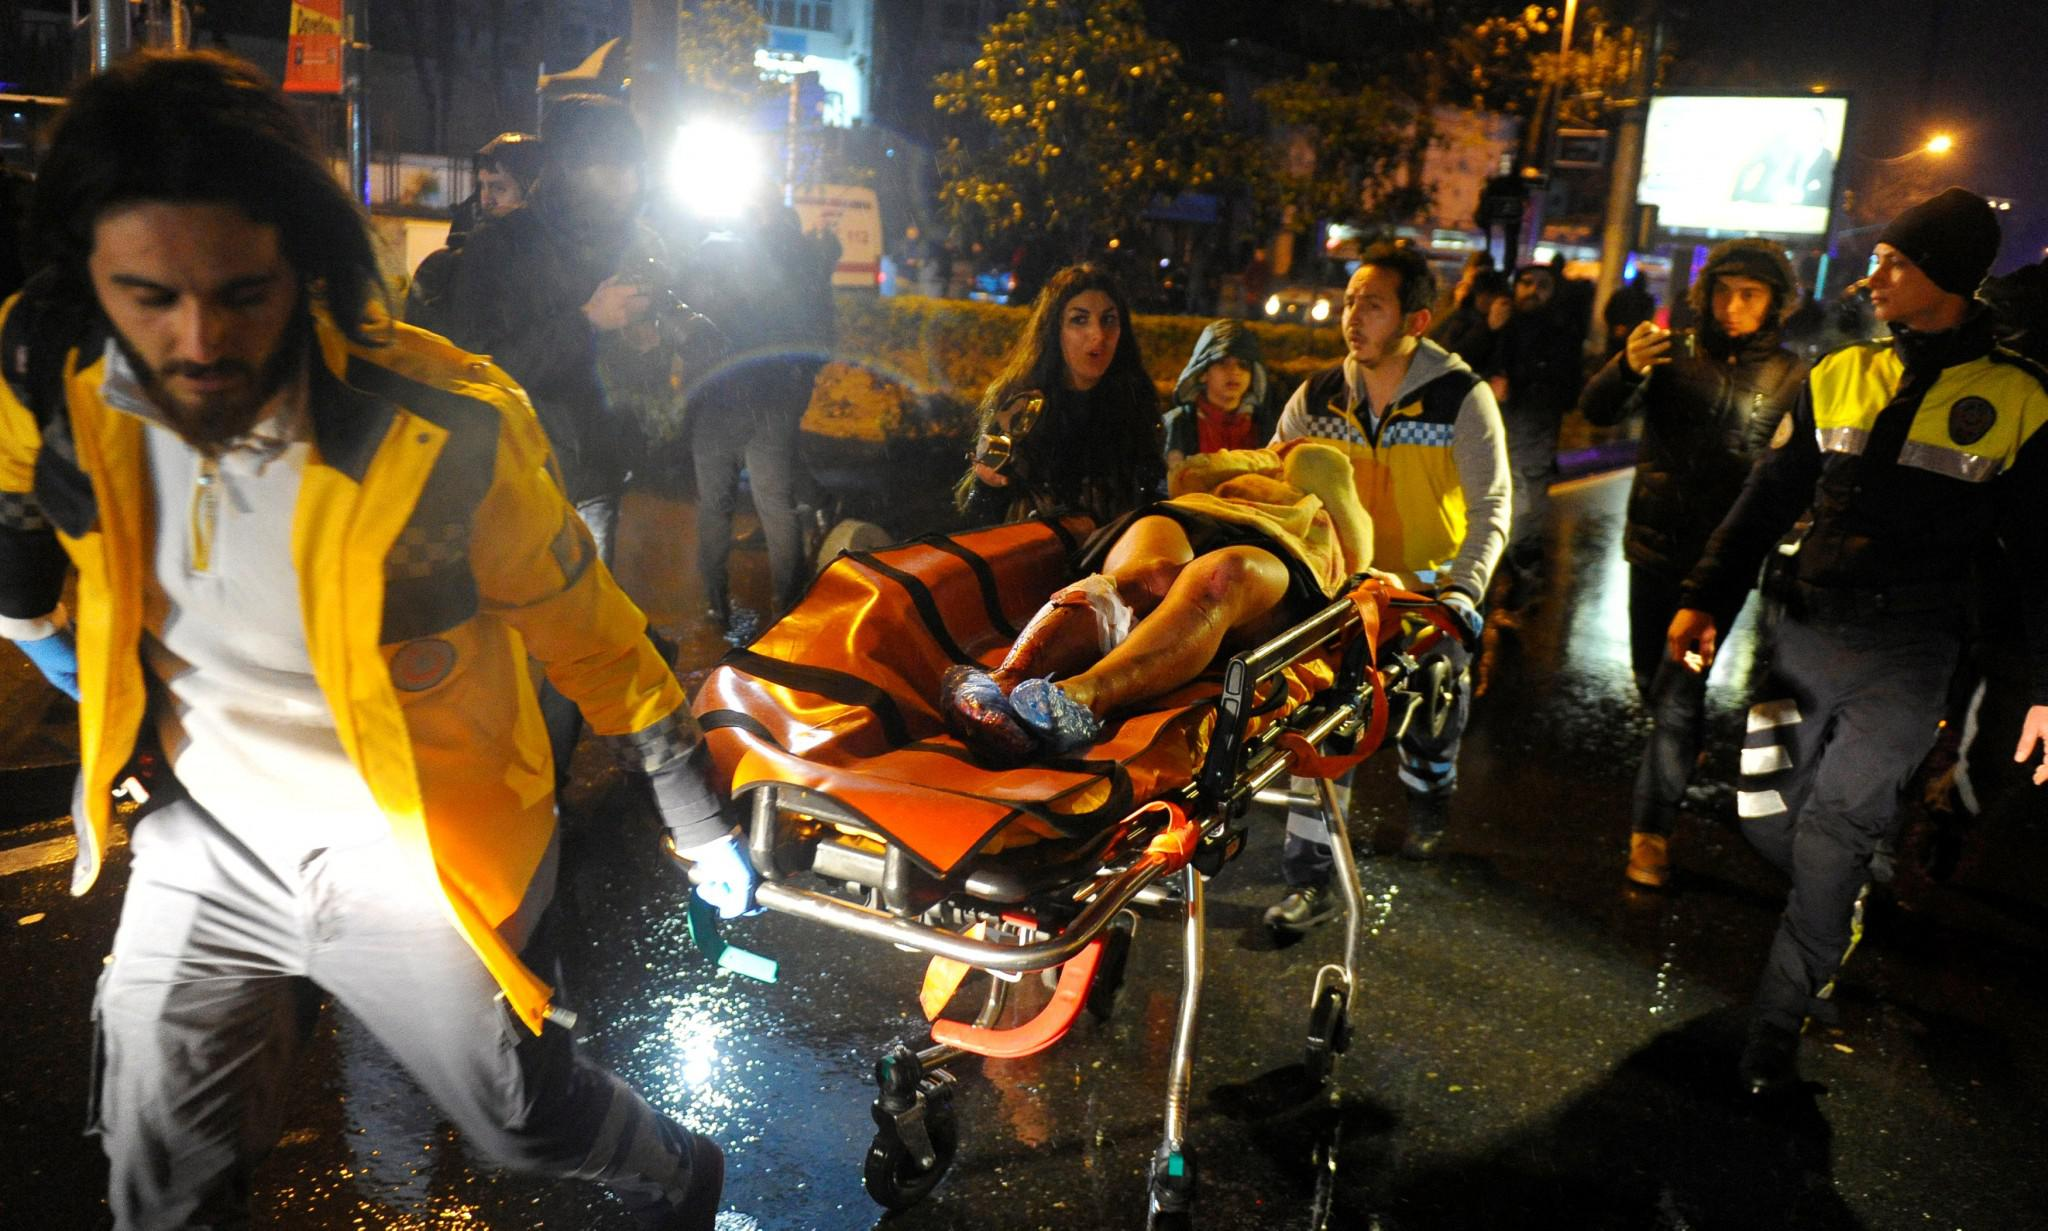 2017-01-01T003032Z_1011523111_RC1E6BD0FCF0_RTRMADP_3_TURKEY-ATTACK Δεκάδες νεκροί από επίθεση ενόπλων σε κλάμπ στην Κωνσταντινούπολη